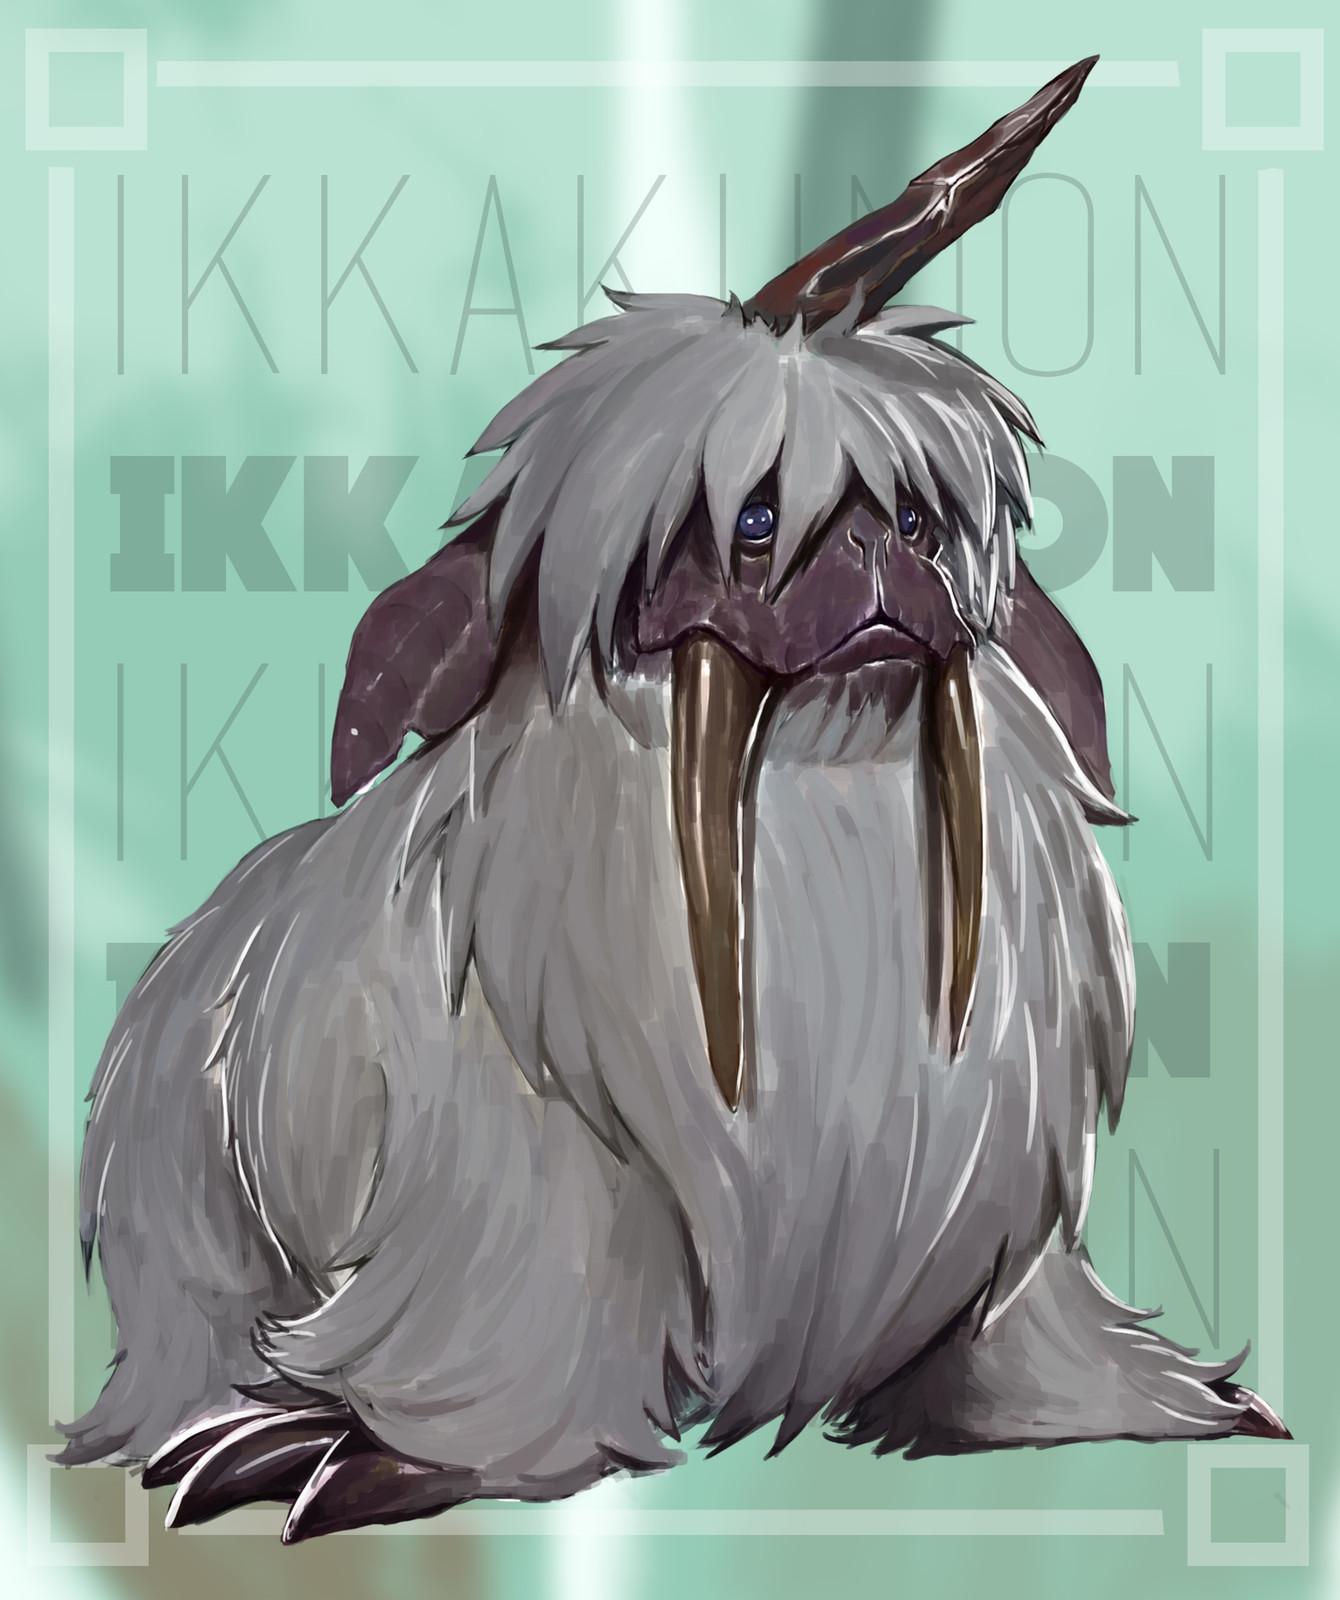 Ikkakumon